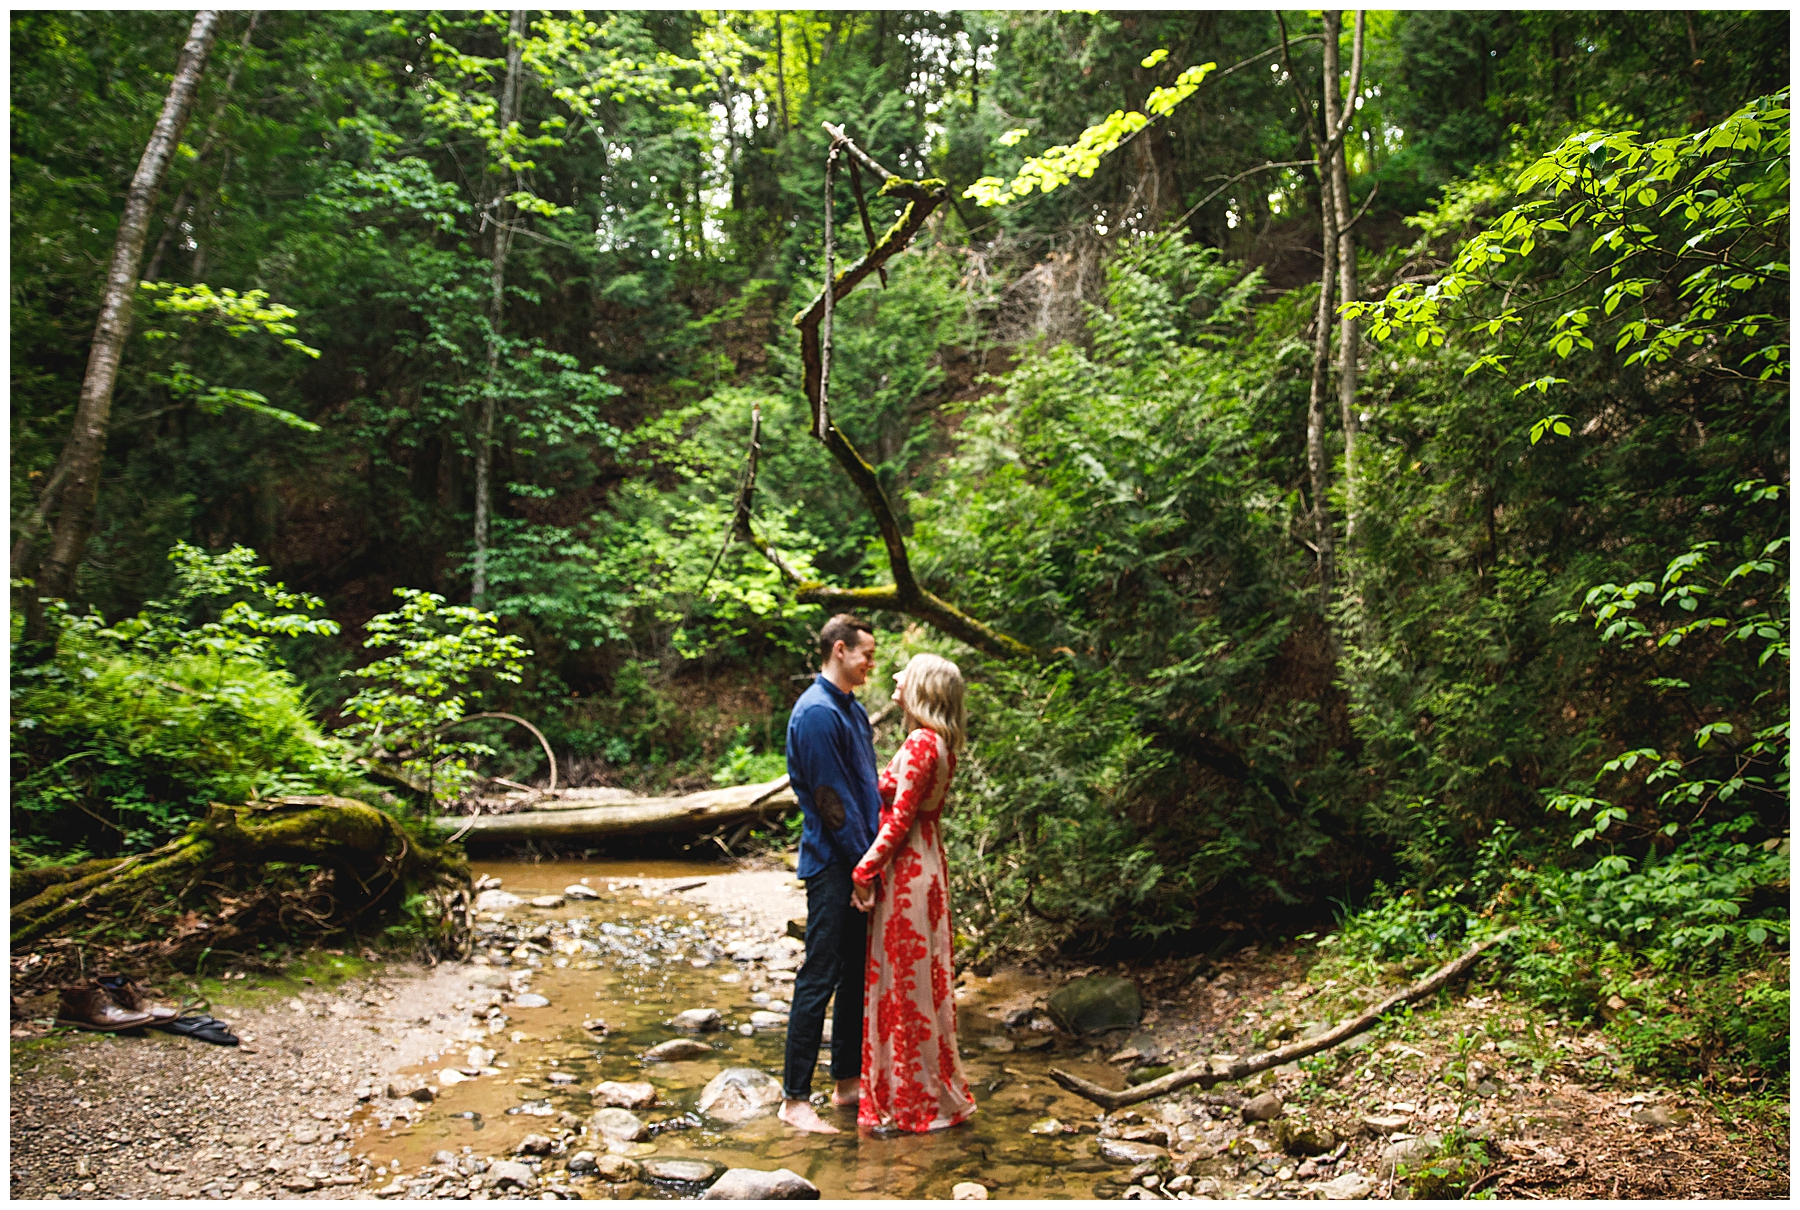 Romantic + Whimsical woodland engagement session - Chelsea Matson Photography